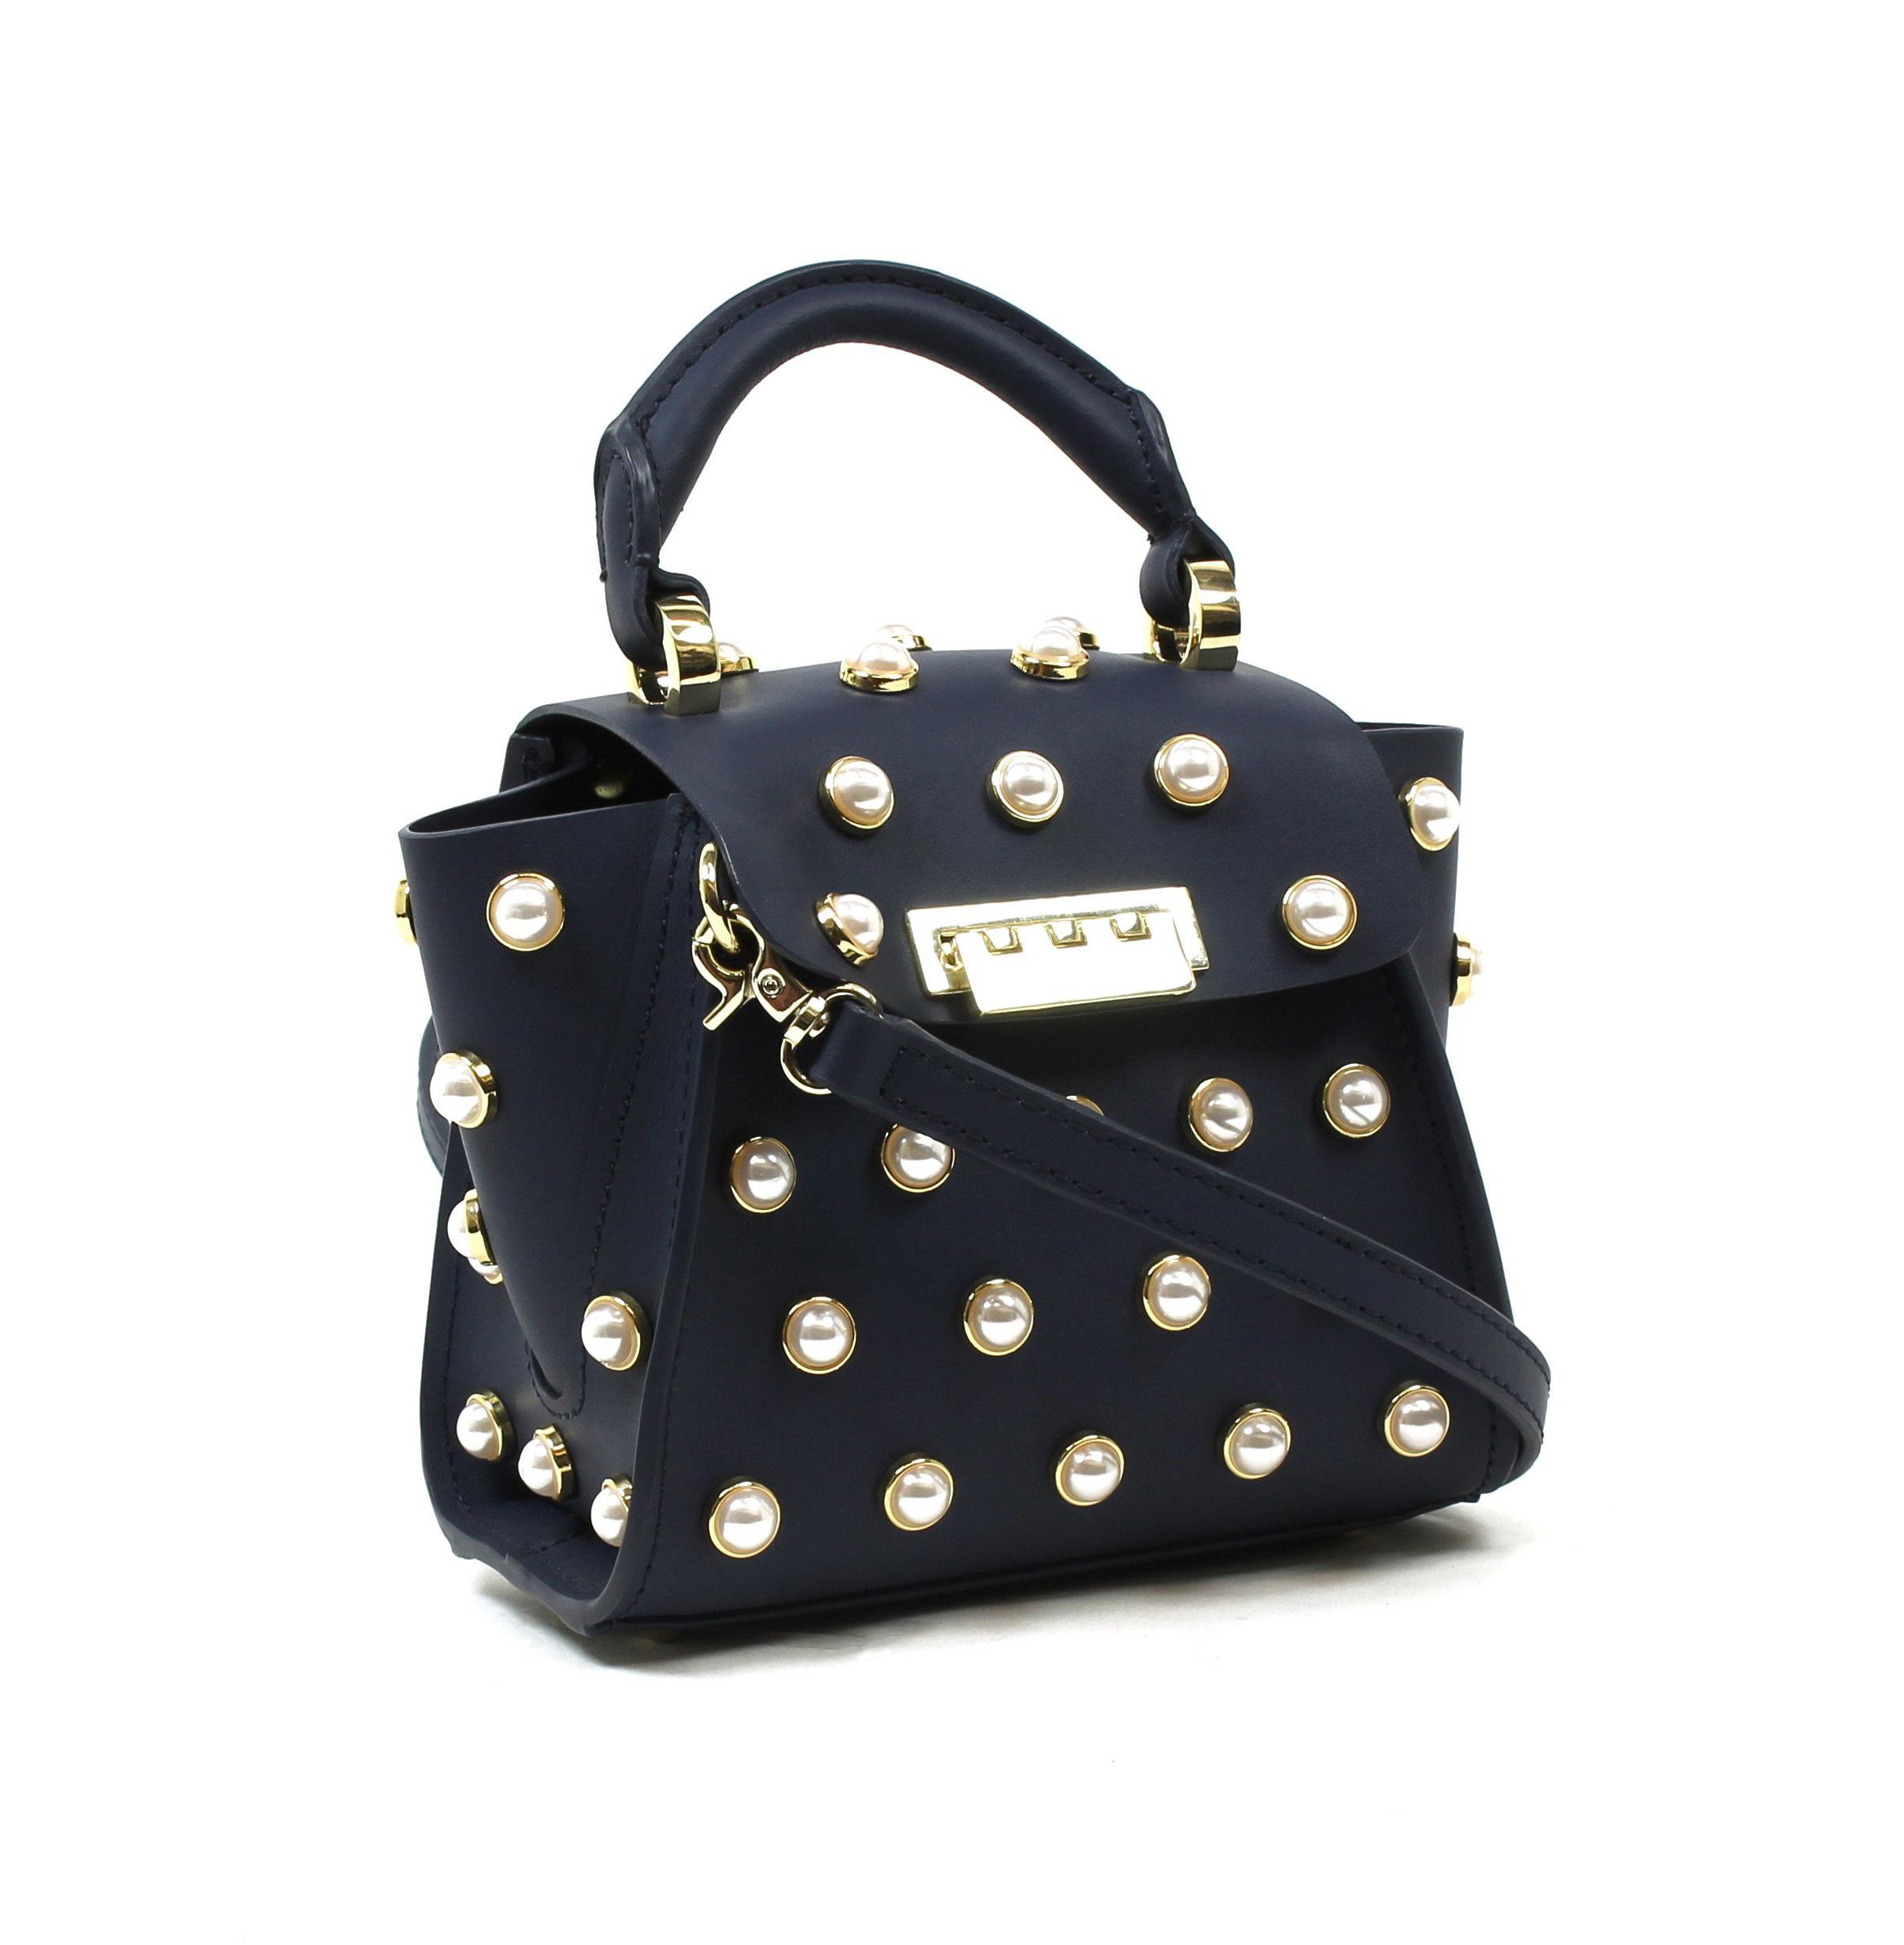 zacposen包 前美国第一夫人都爱的包包